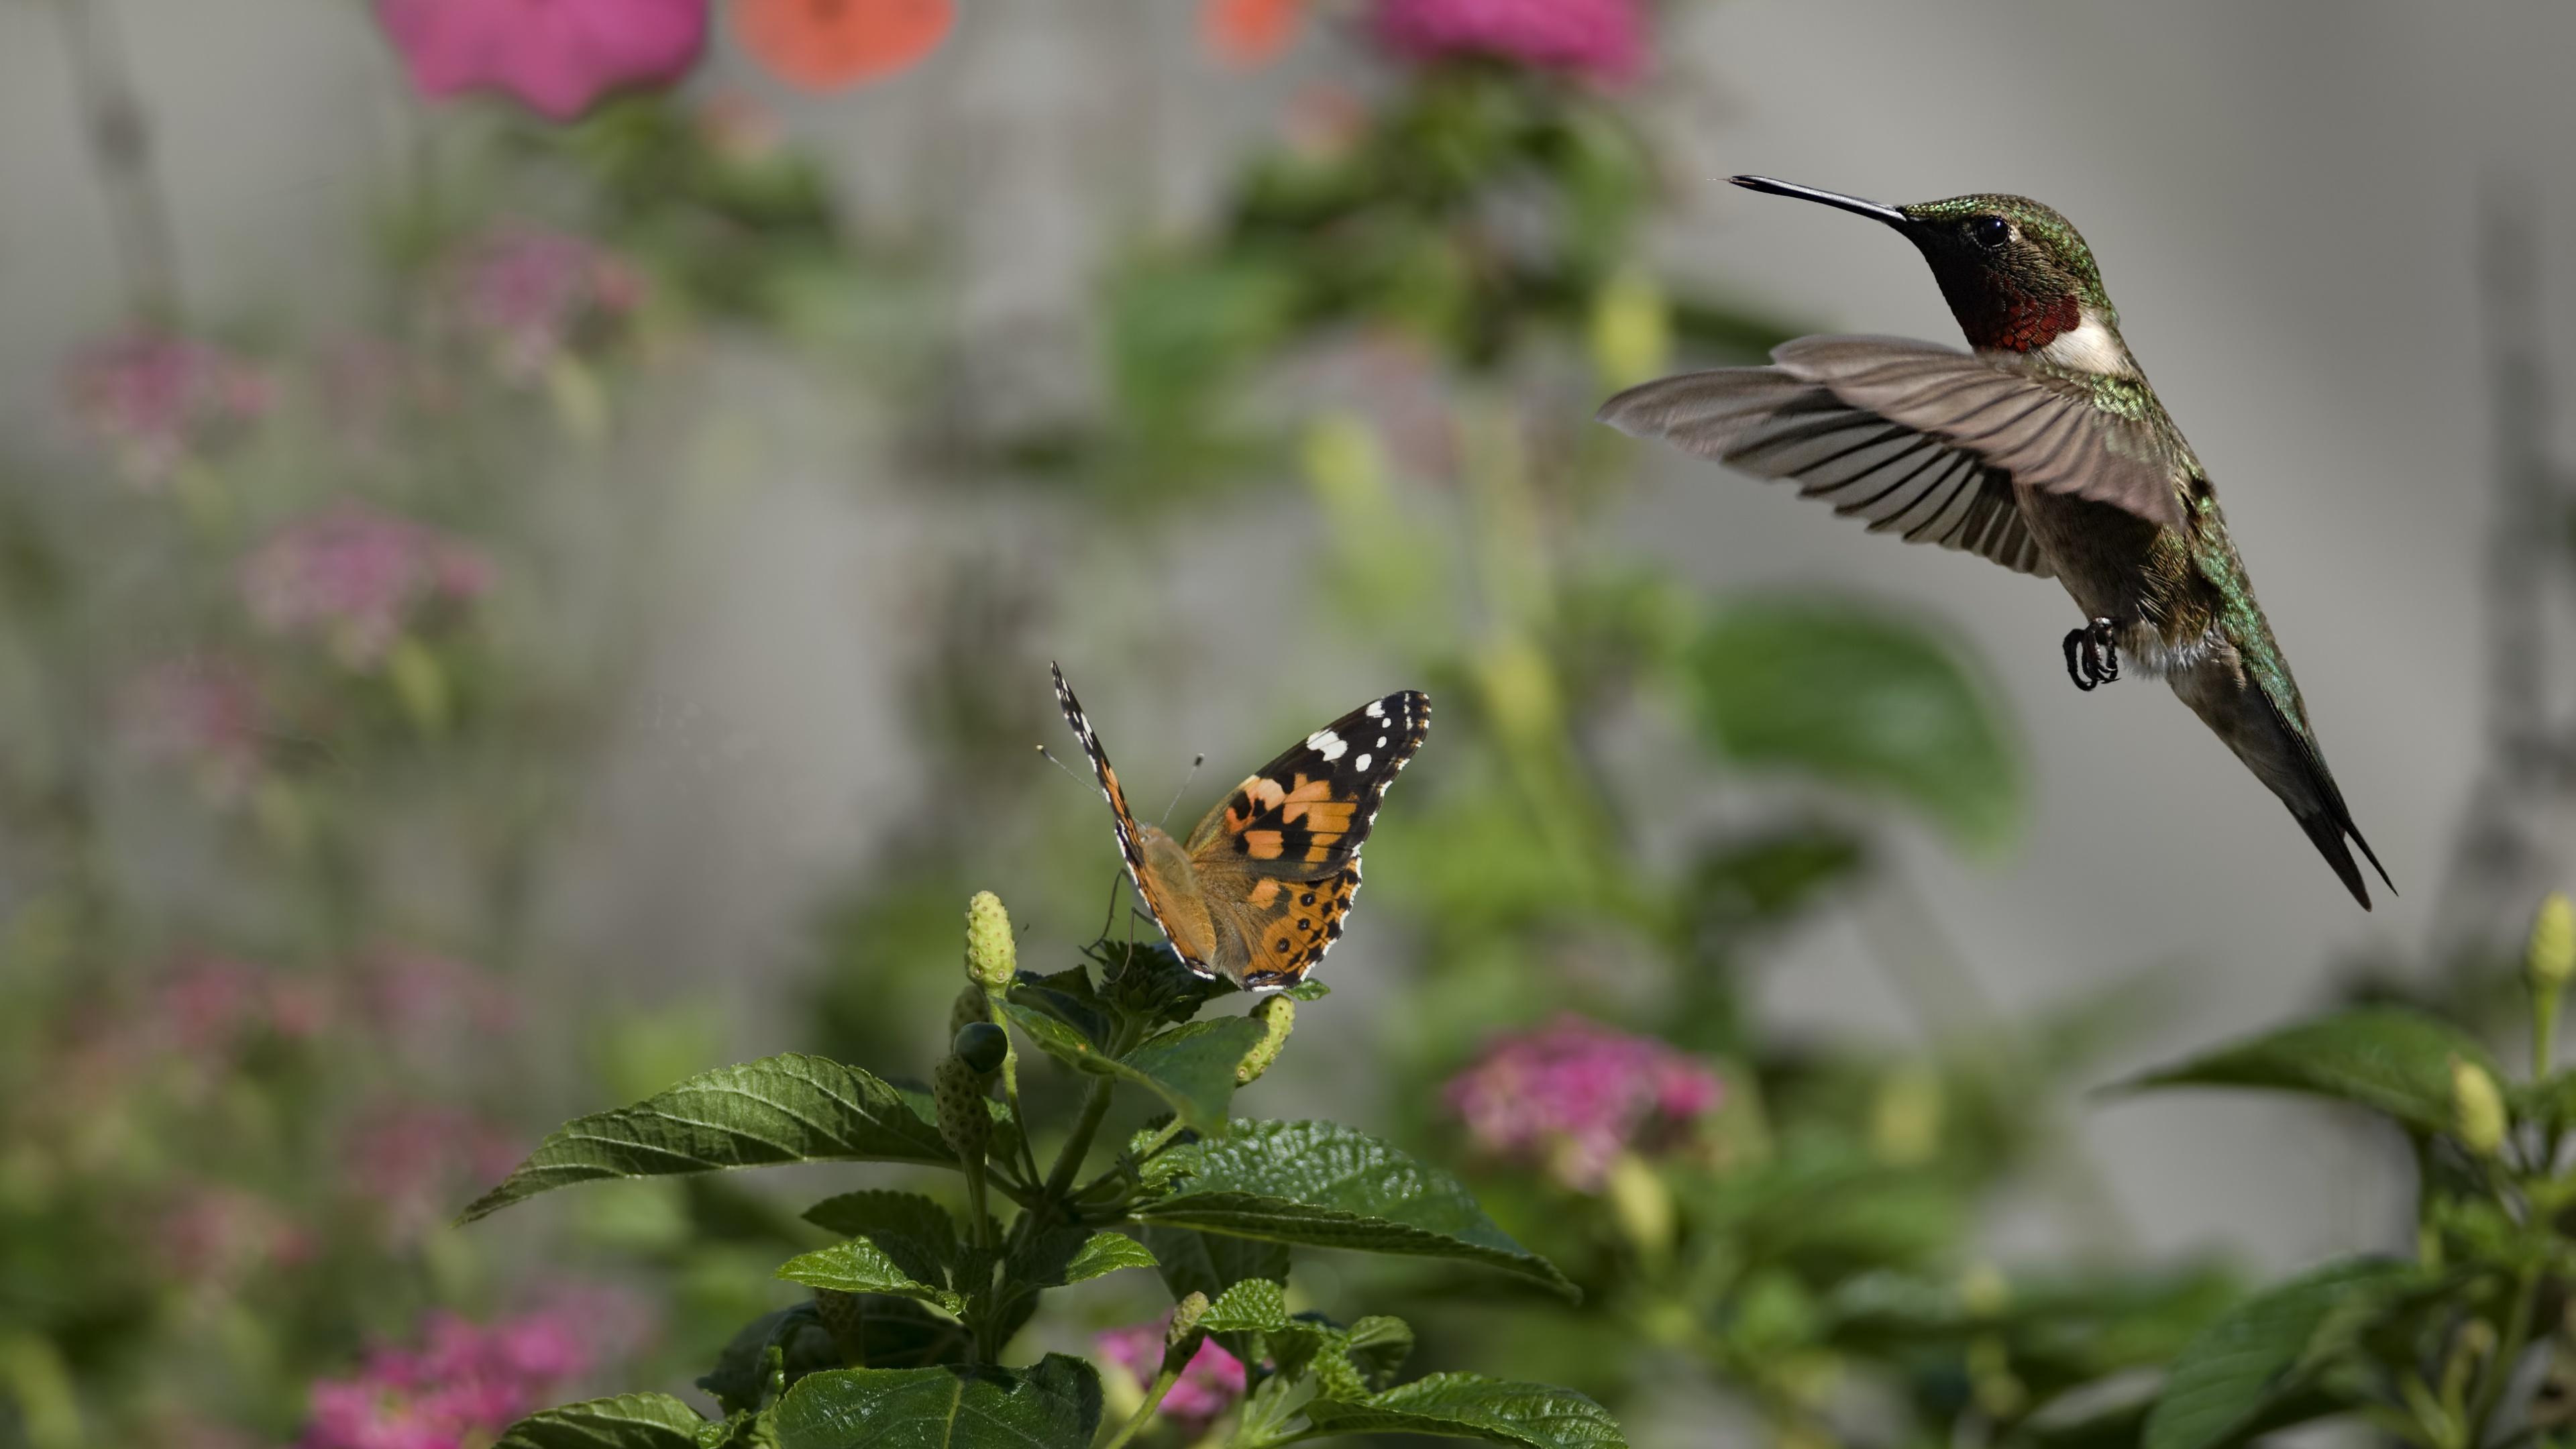 Hummingbird and butterfly wallpaper